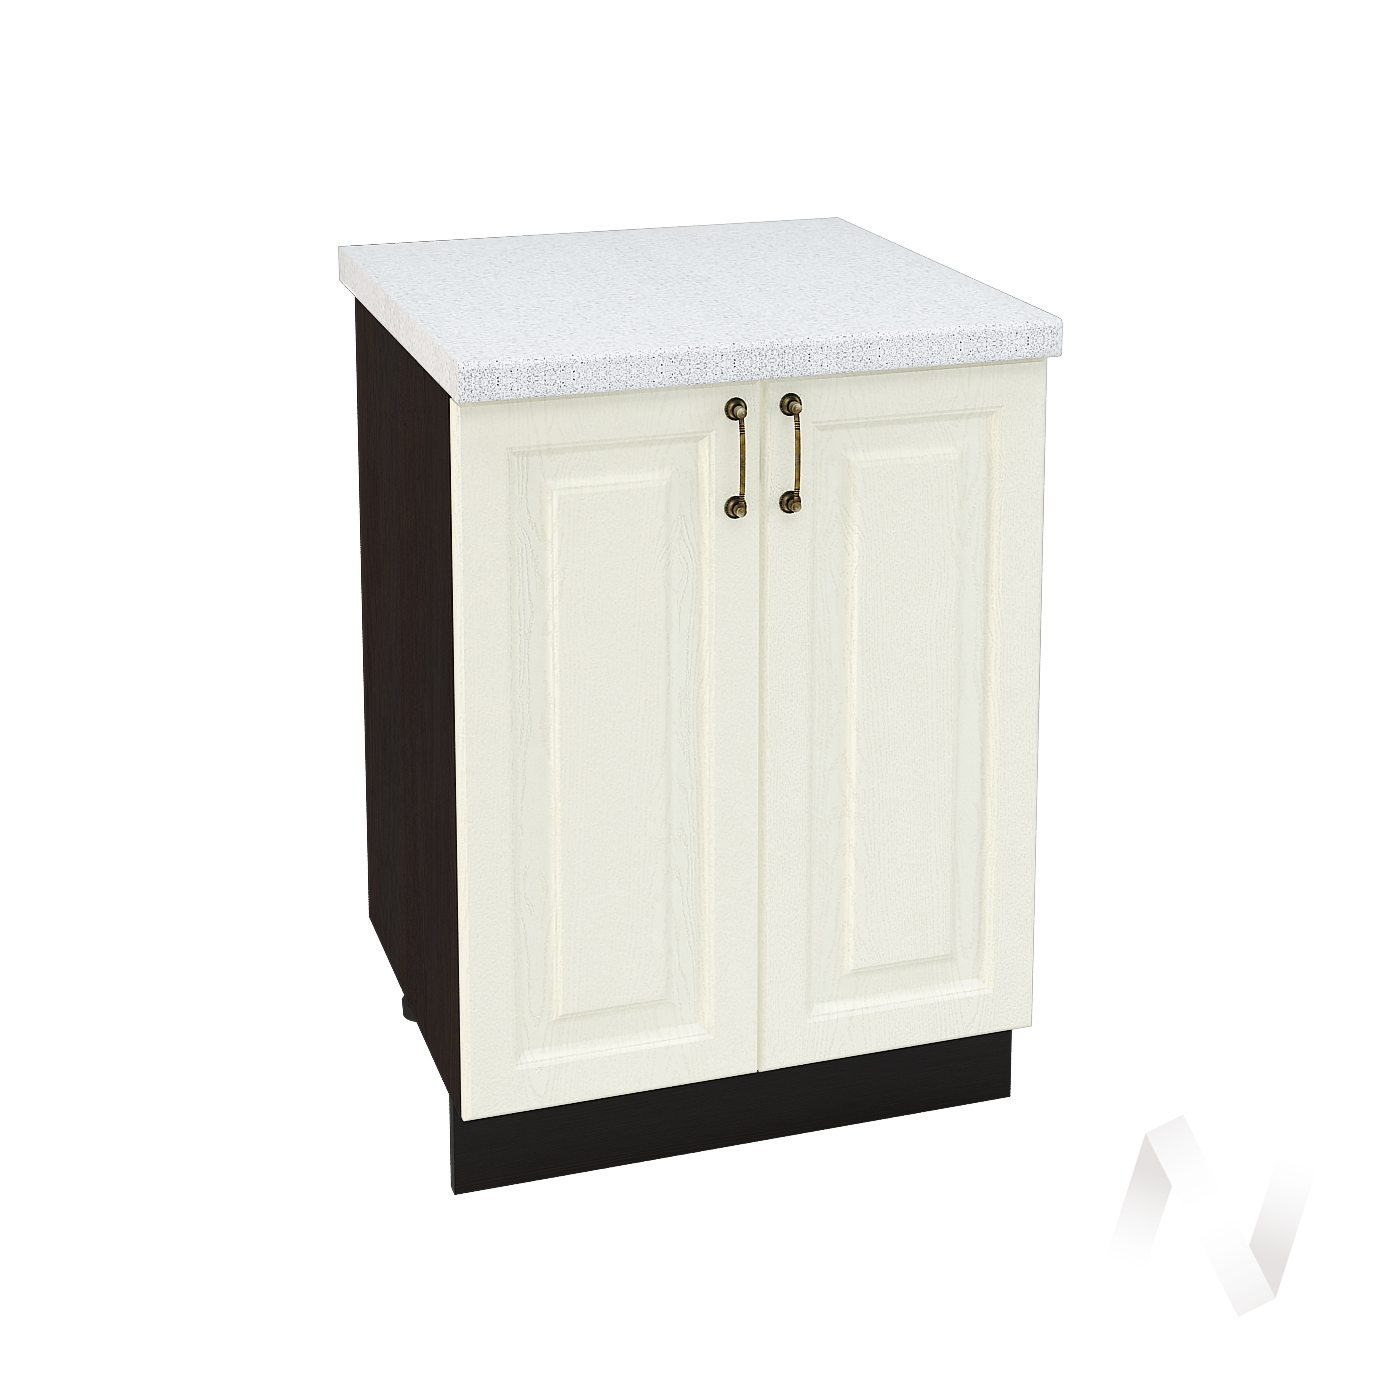 "Кухня ""Ницца"": Шкаф нижний 600, ШН 600 (Крем/корпус венге)"